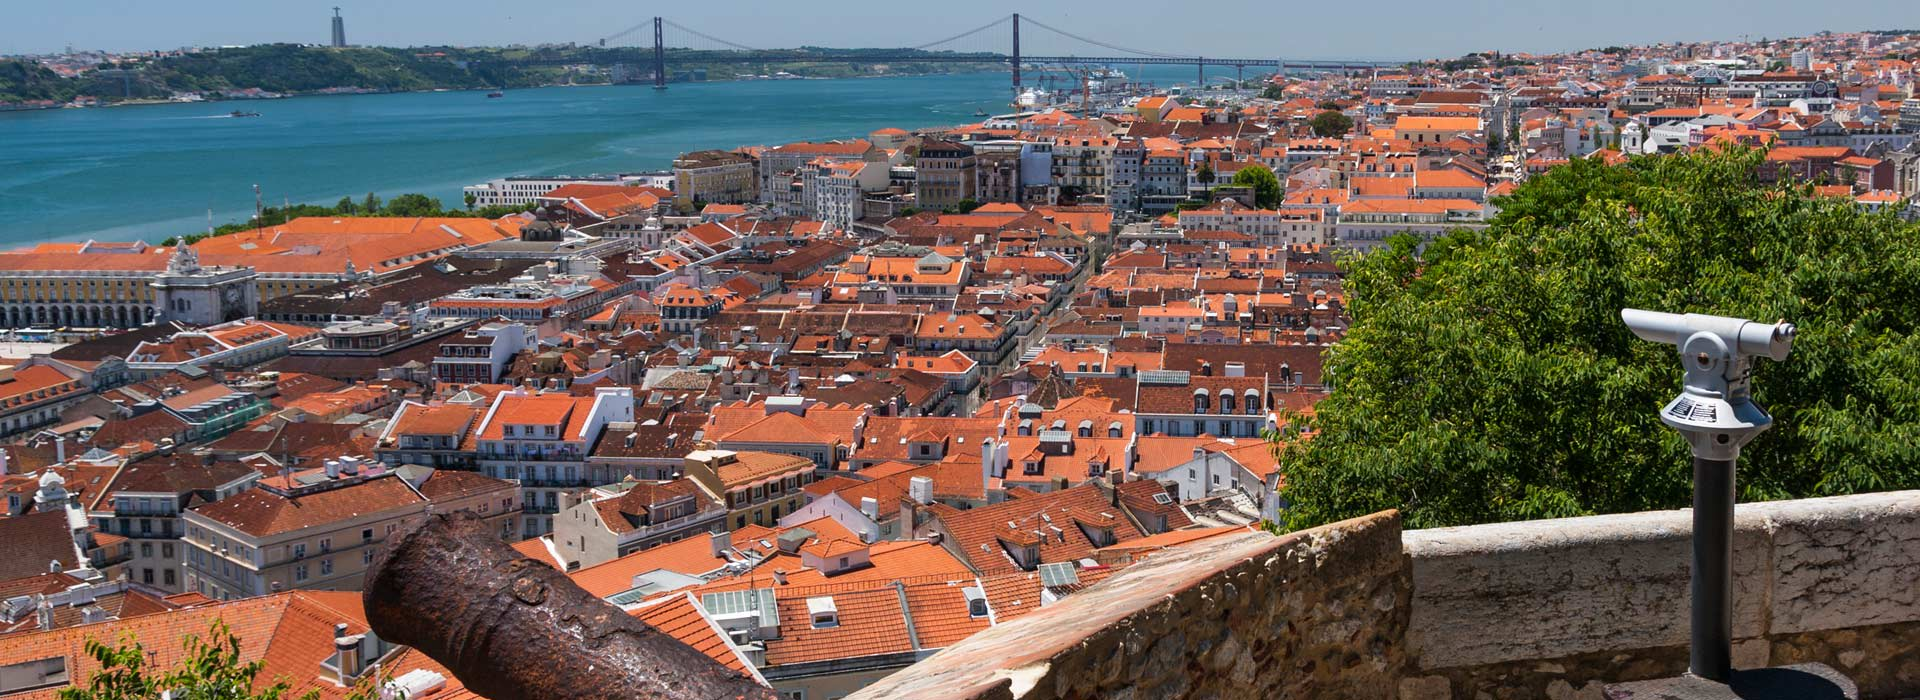 AVANI Avenida Liberdade Lisbon Hotel - Playing